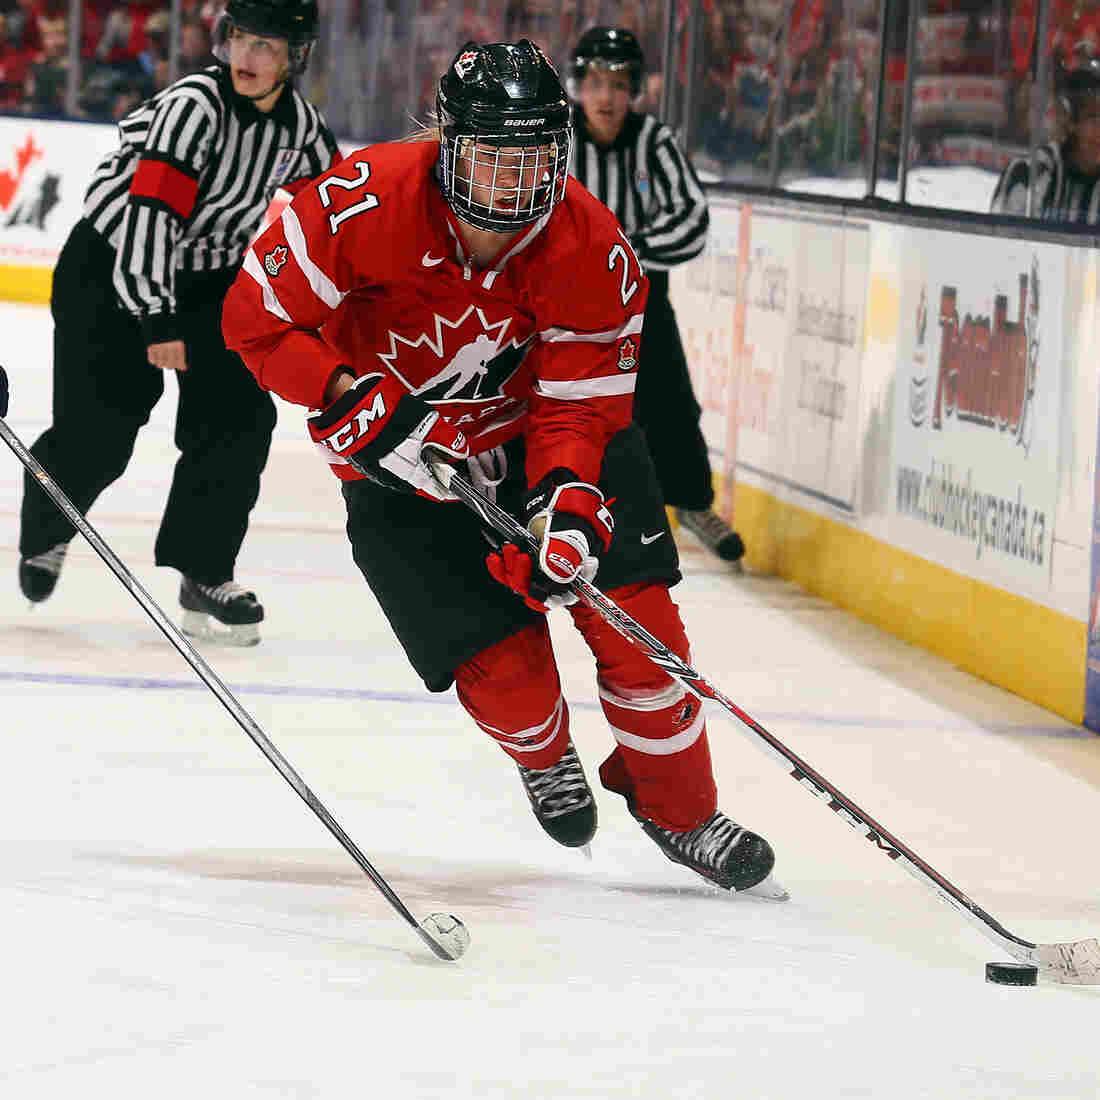 U.S. And Canadian Women's Hockey Brings Plenty Of Heat To The Ice